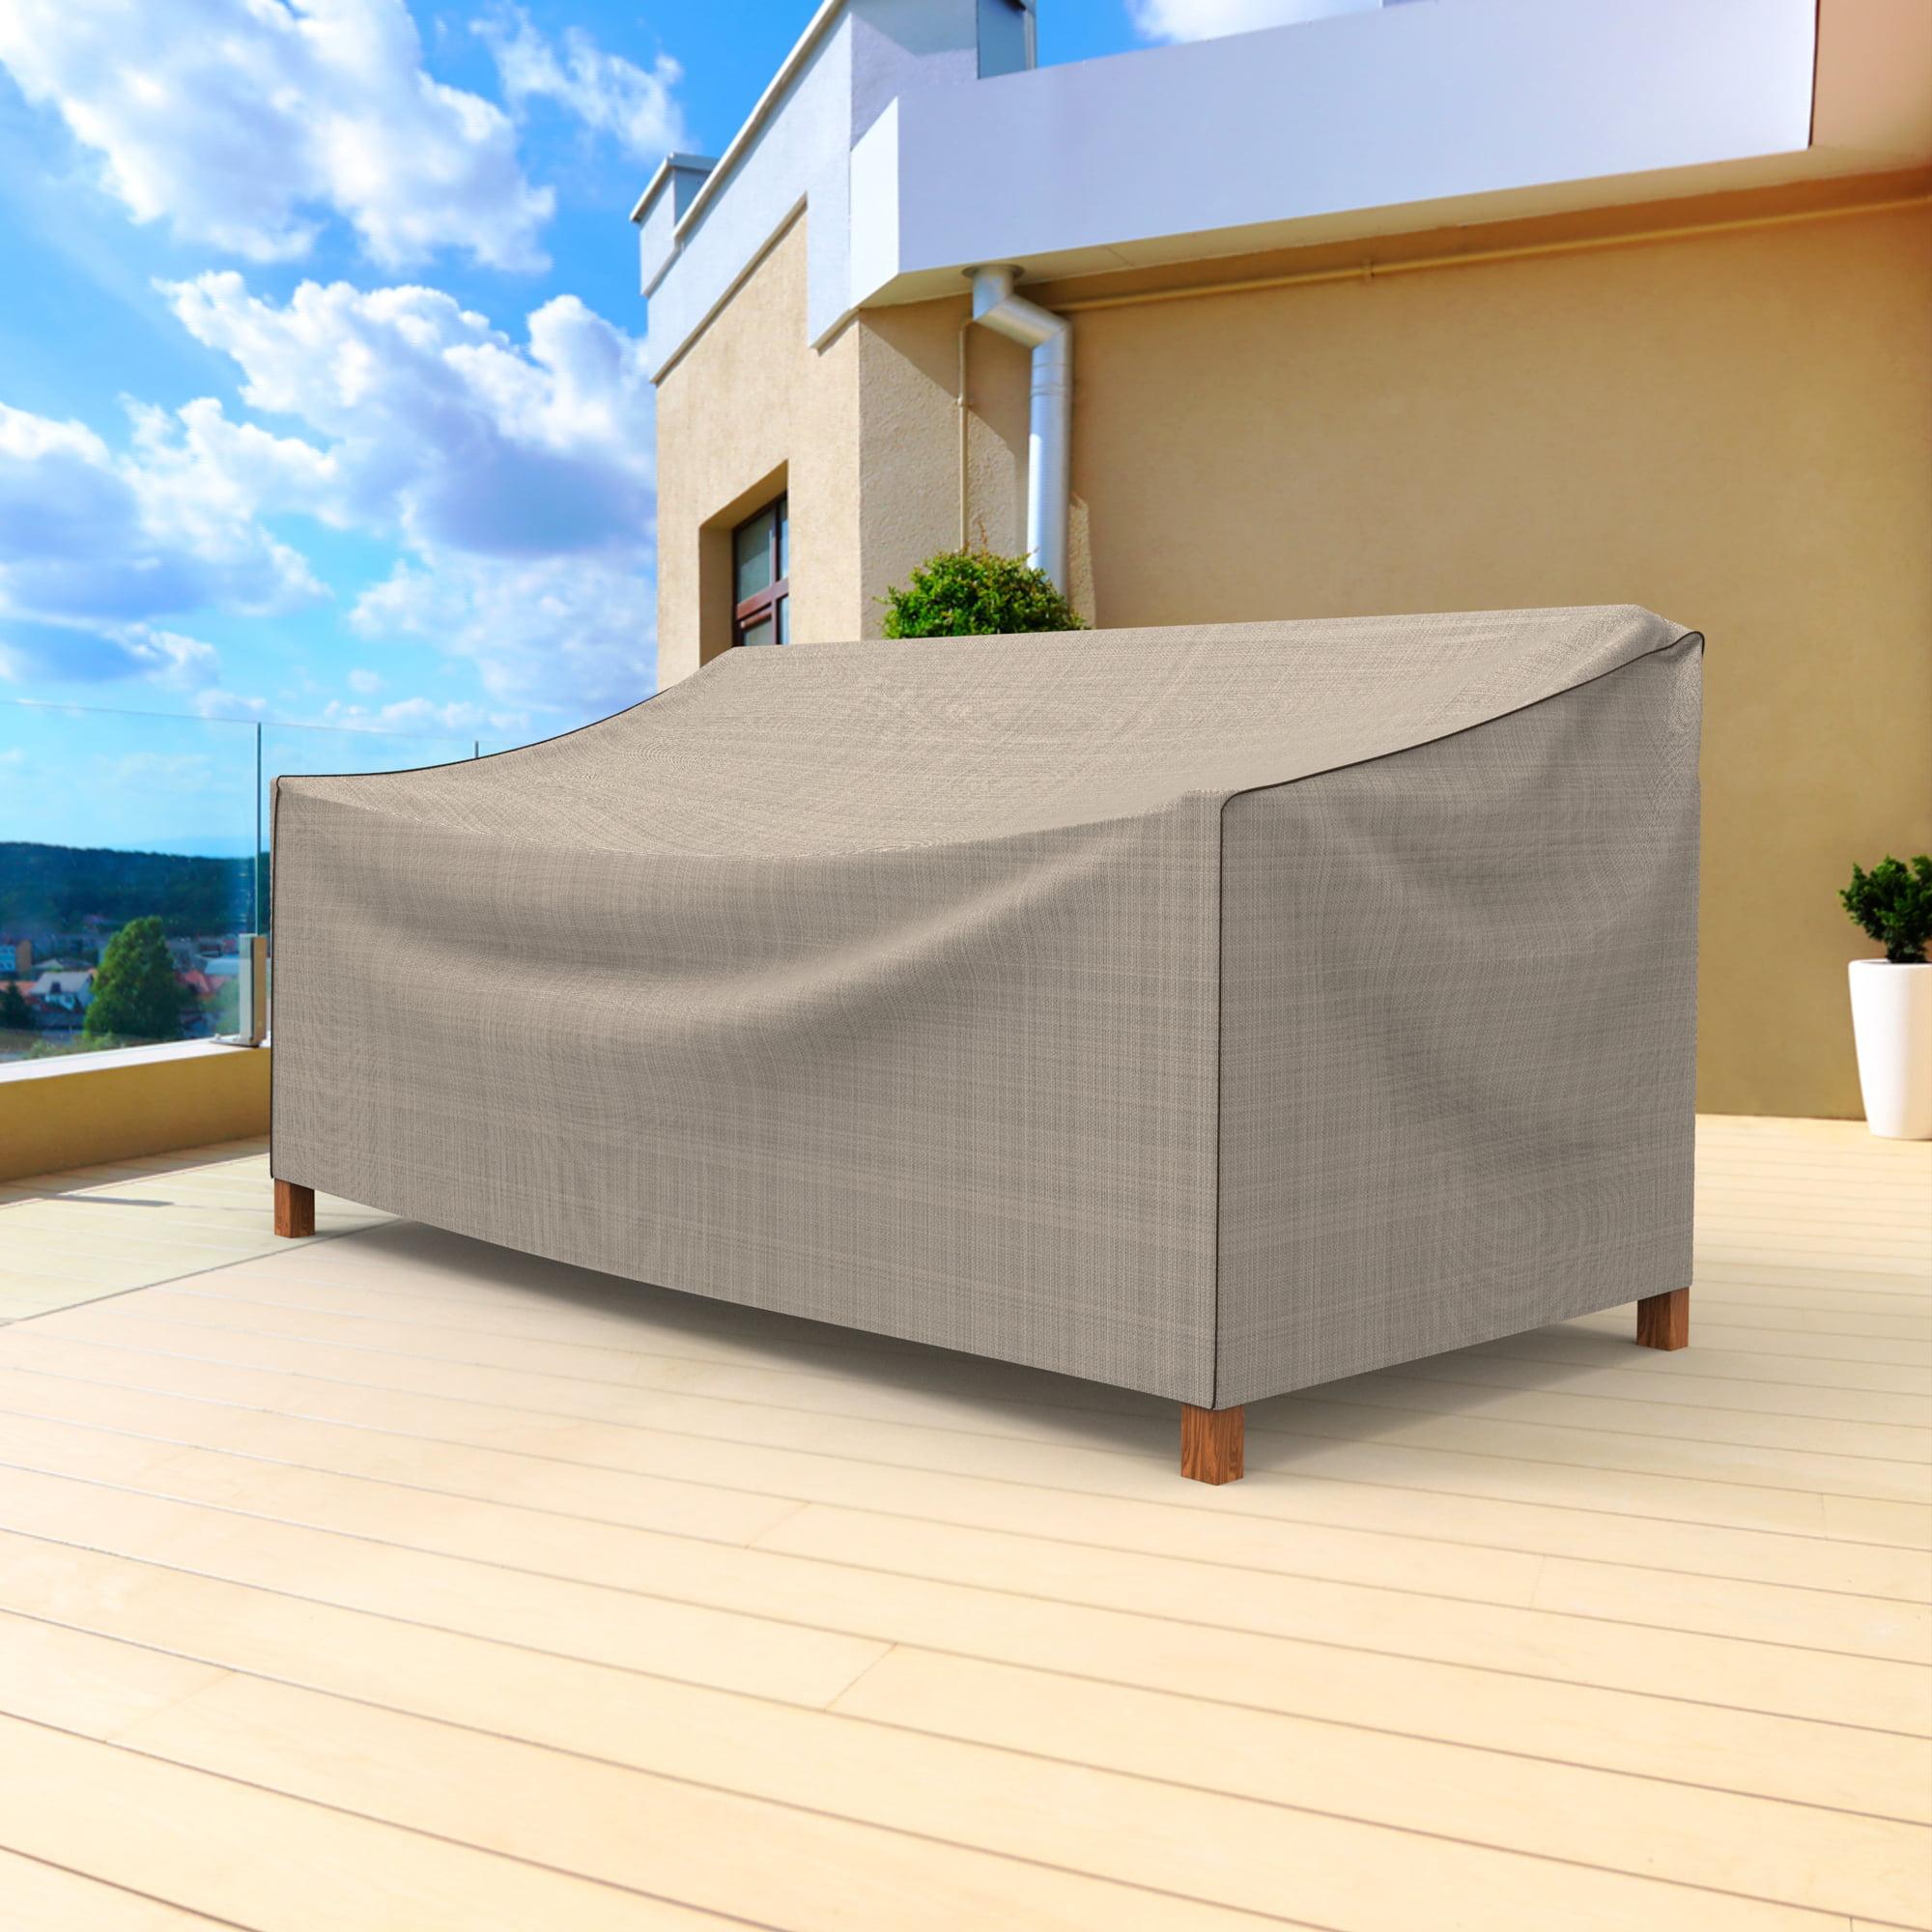 Budge Small Tan Tweed Patio Outdoor Loveseat Cover, English Garden